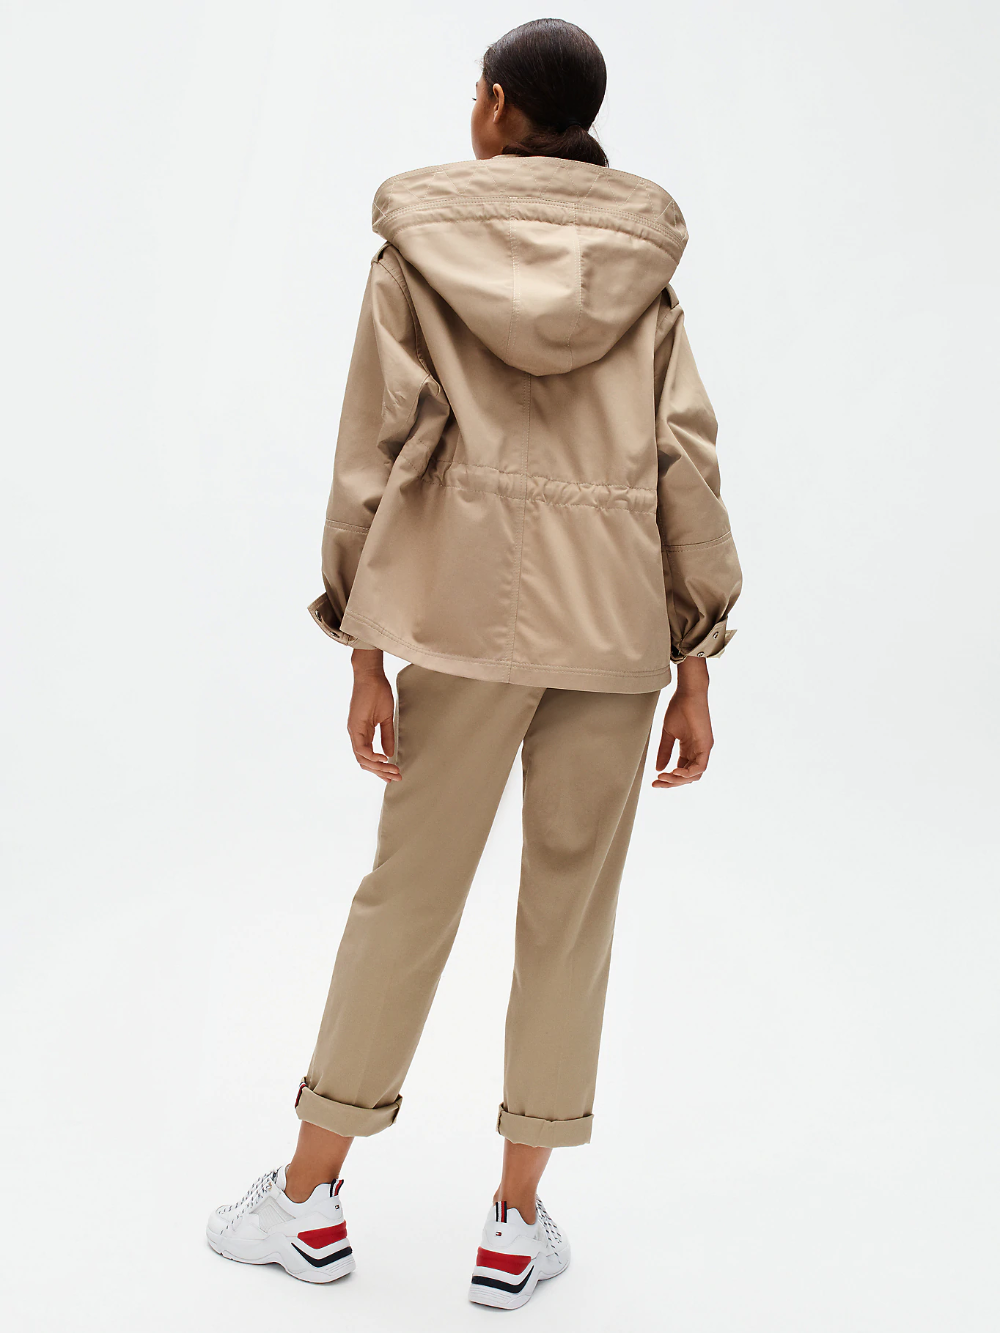 Cotton Twill Hooded Utility Jacket Beige Tommy Hilfiger Women S Coats Jackets Outerwear Jackets Short Jacket [ 1333 x 1000 Pixel ]